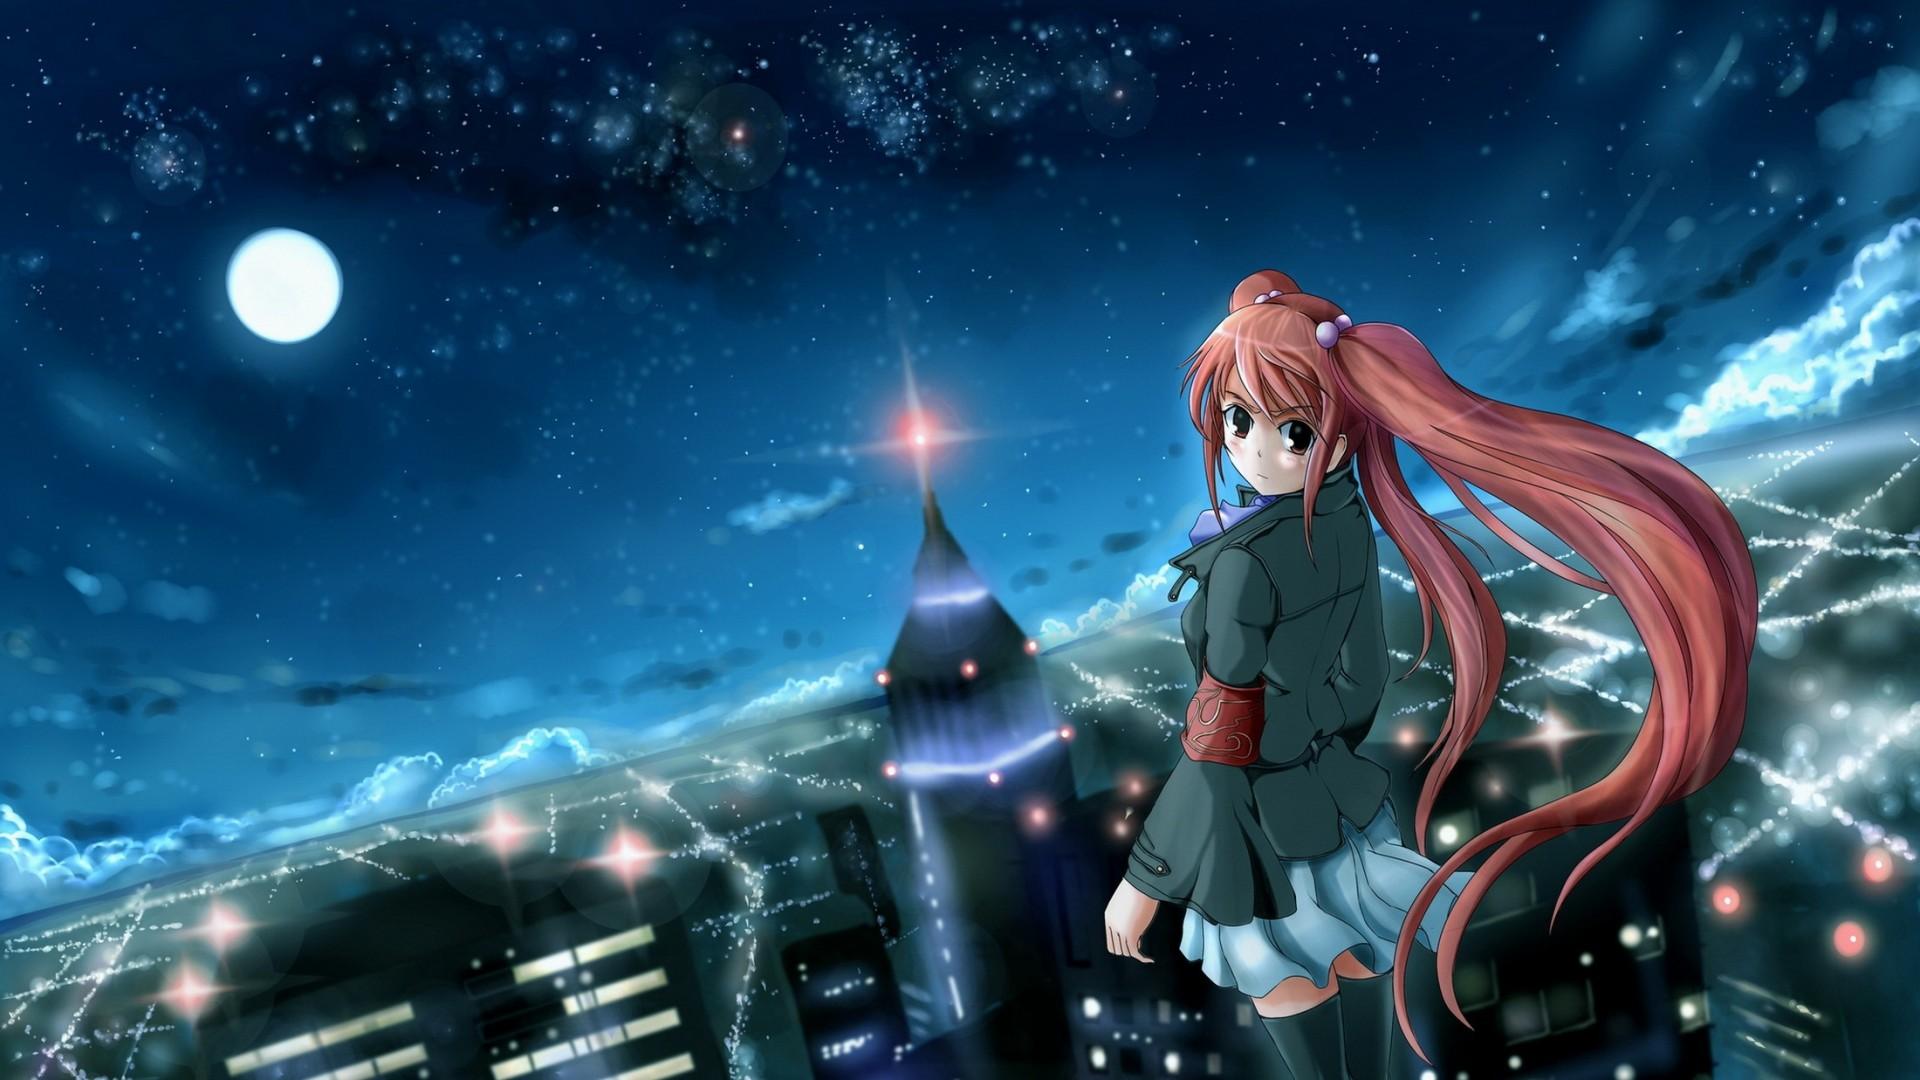 Wallpaper anime, girl, city, night, wind